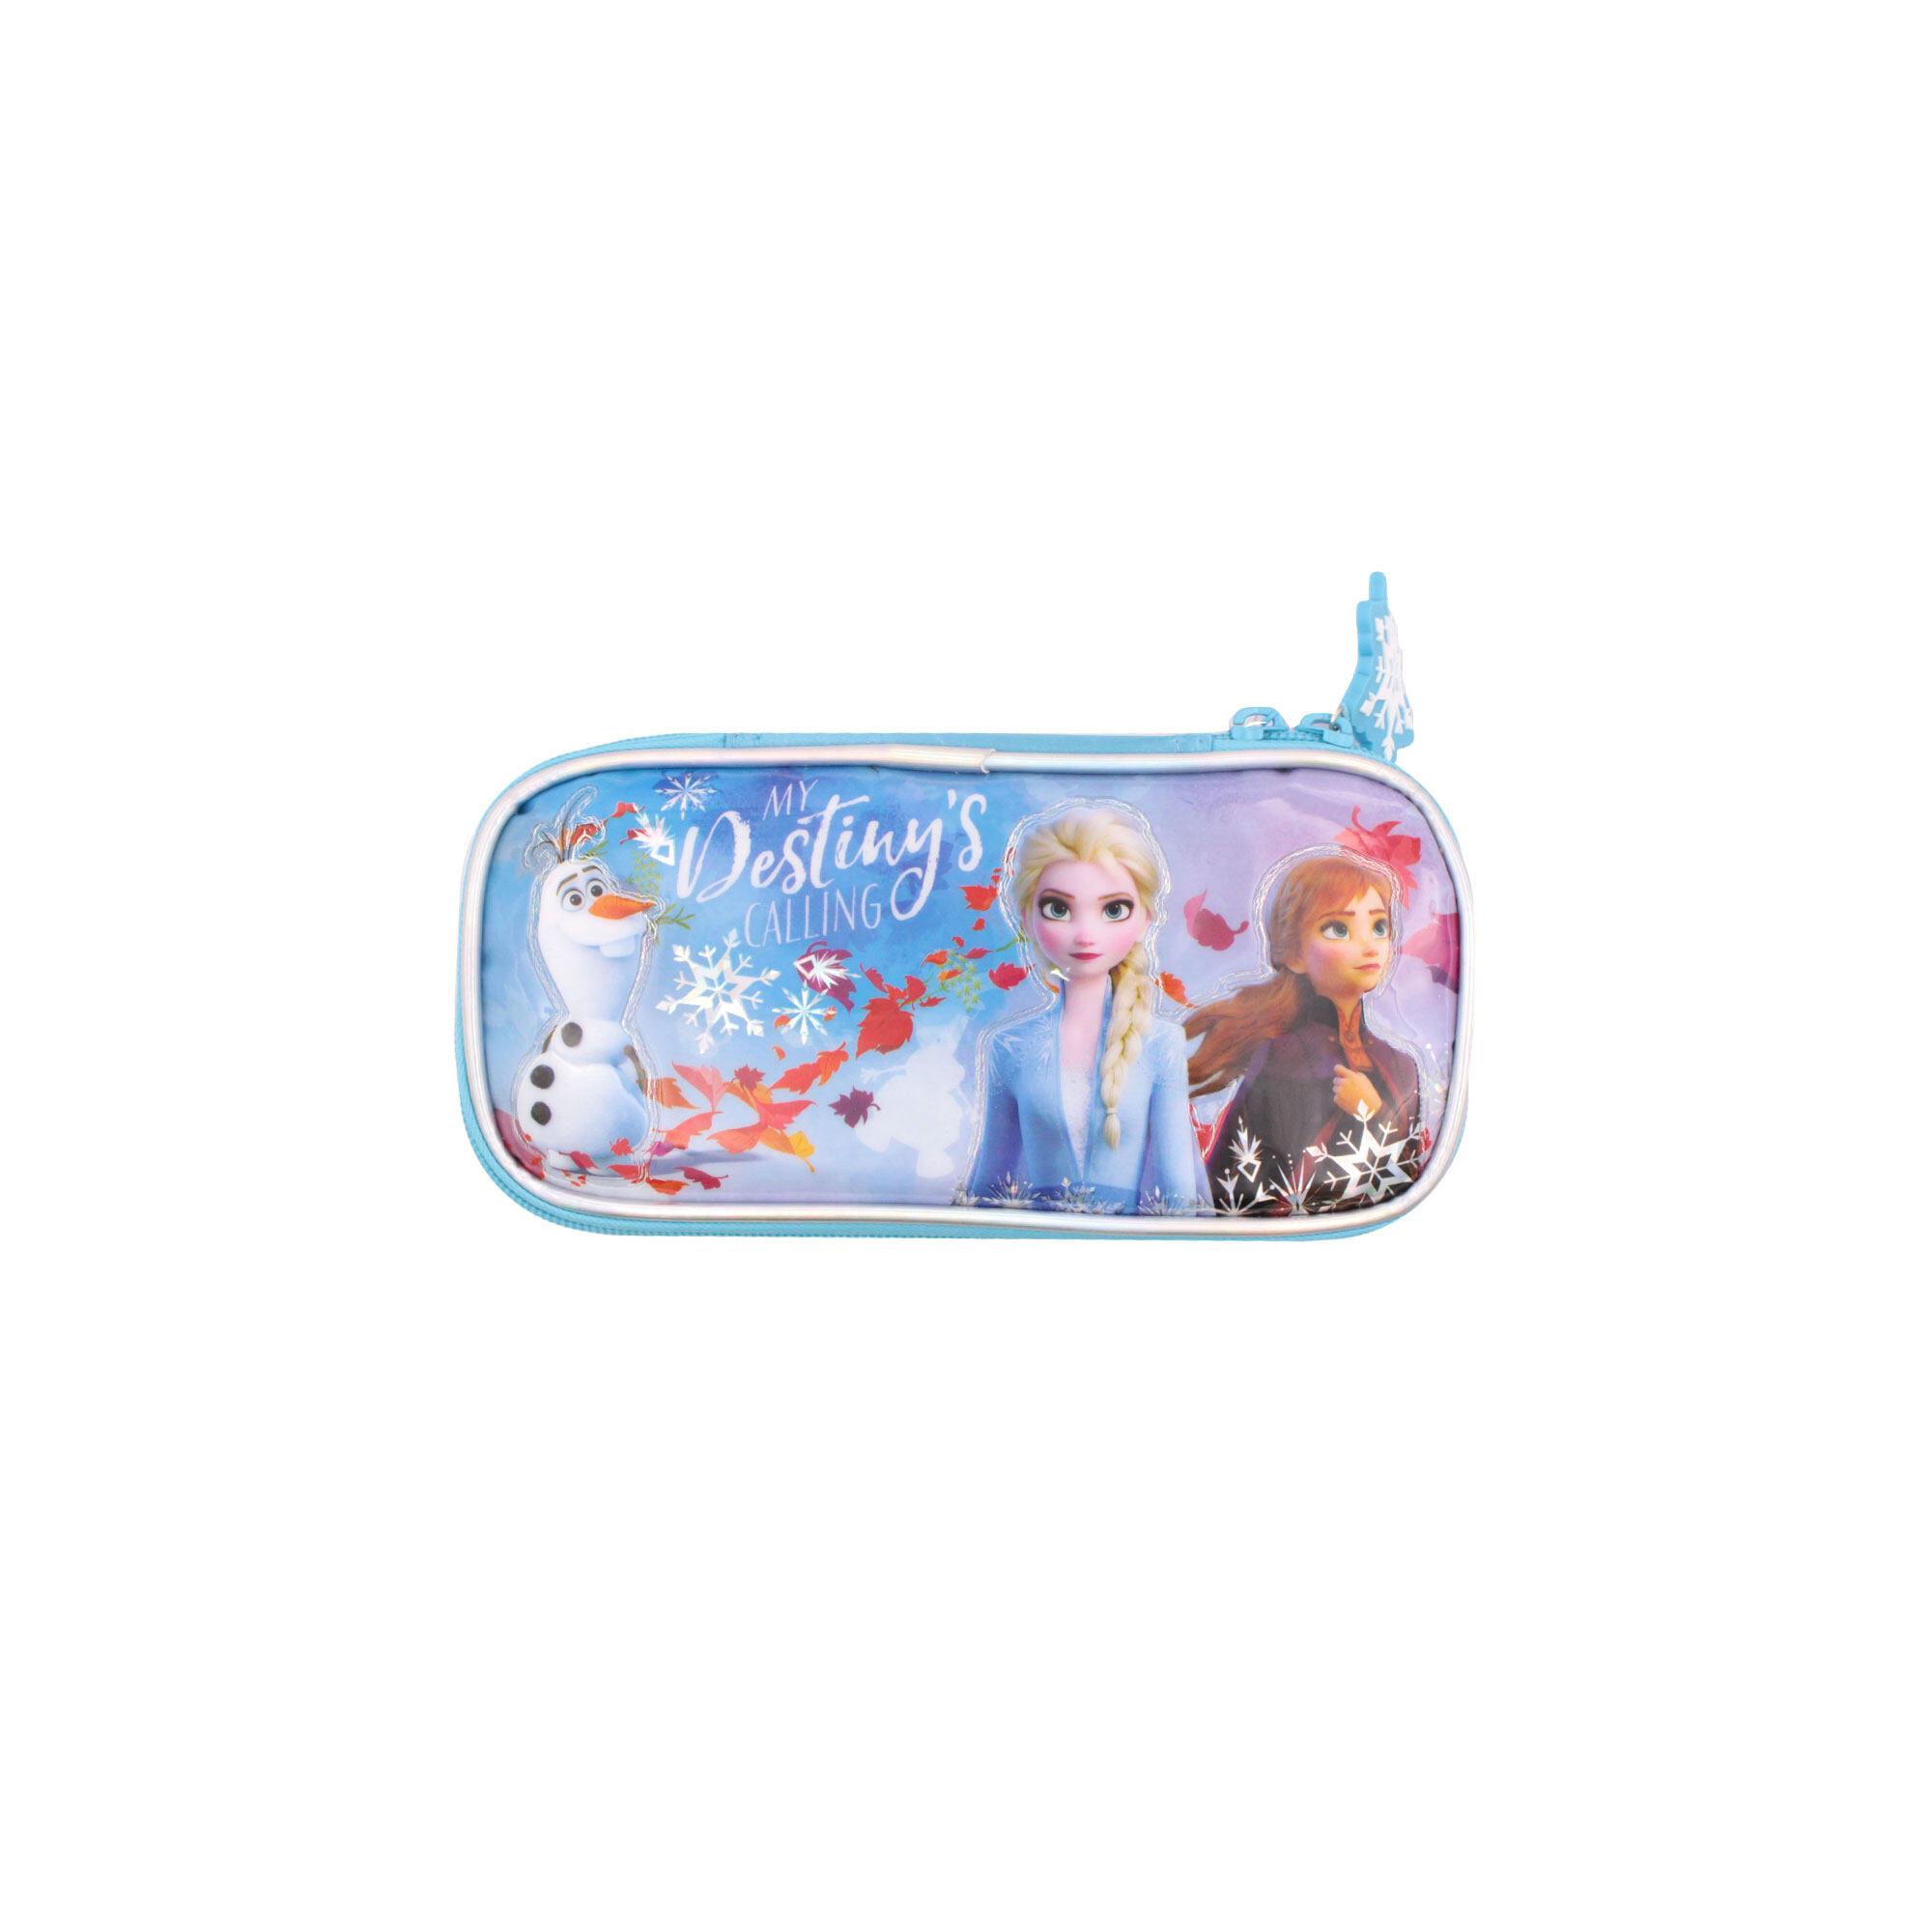 Disney Frozen 2 Princess Elsa, Anna & Olaf School Pencil Case (Light Blue)